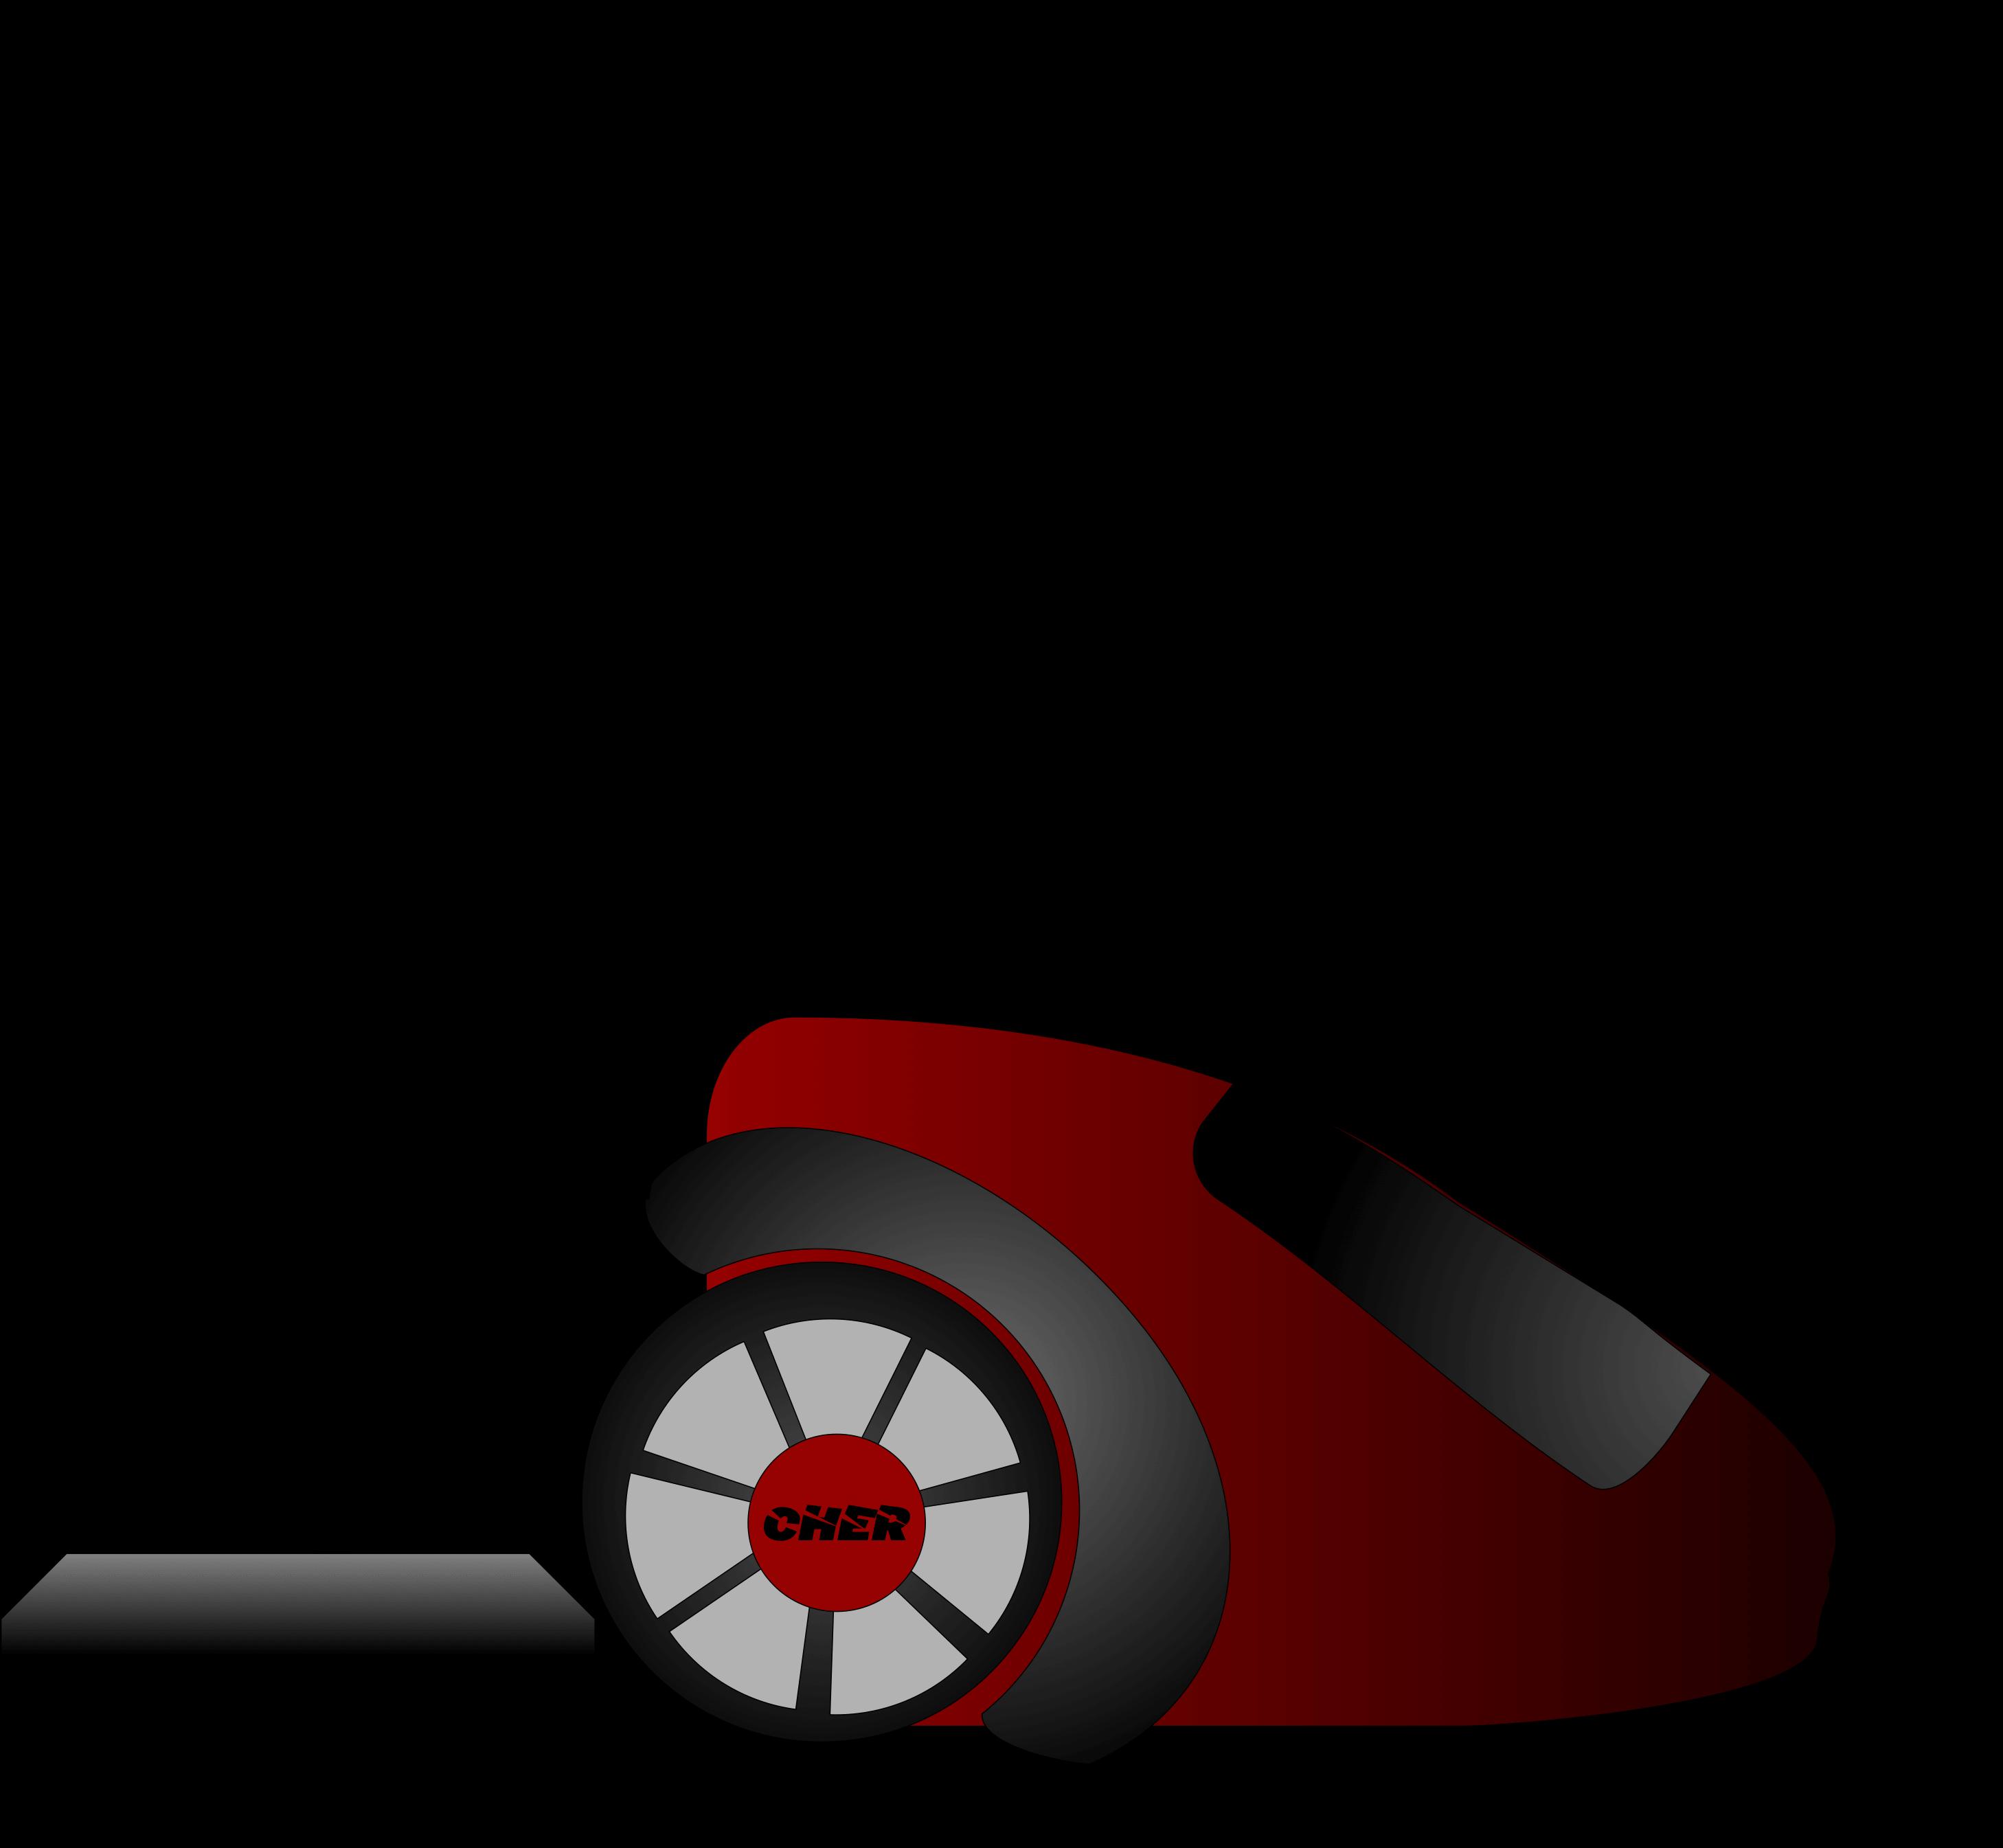 Vacuum Clip Art Free | Clipart Panda - Free Clipart Images Vacuum Clipart